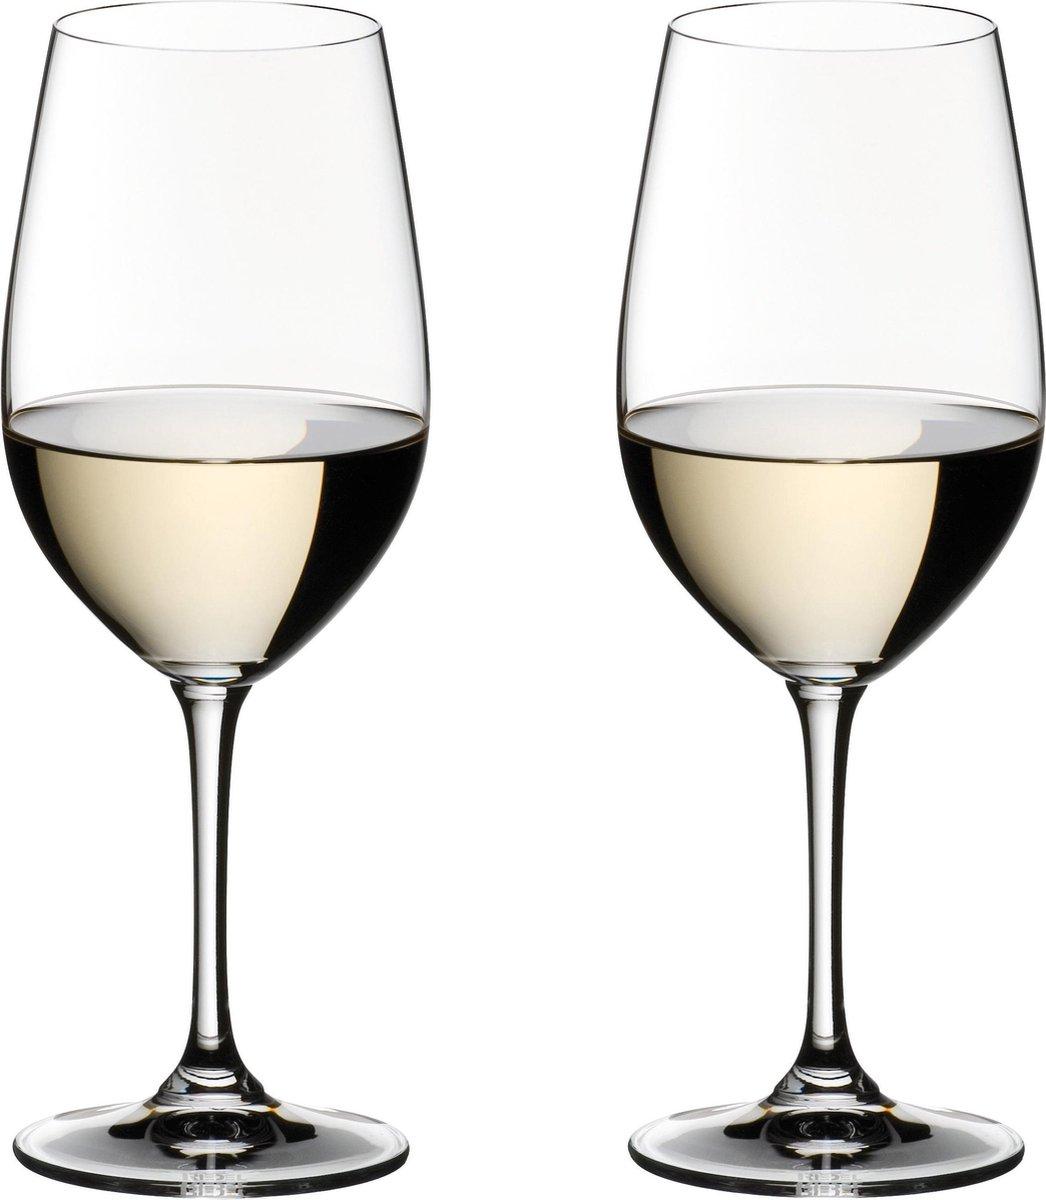 Riedel Vinum Chianti/ Riesling Wijnglas - 0.4 l - 2 stuks - Riedel